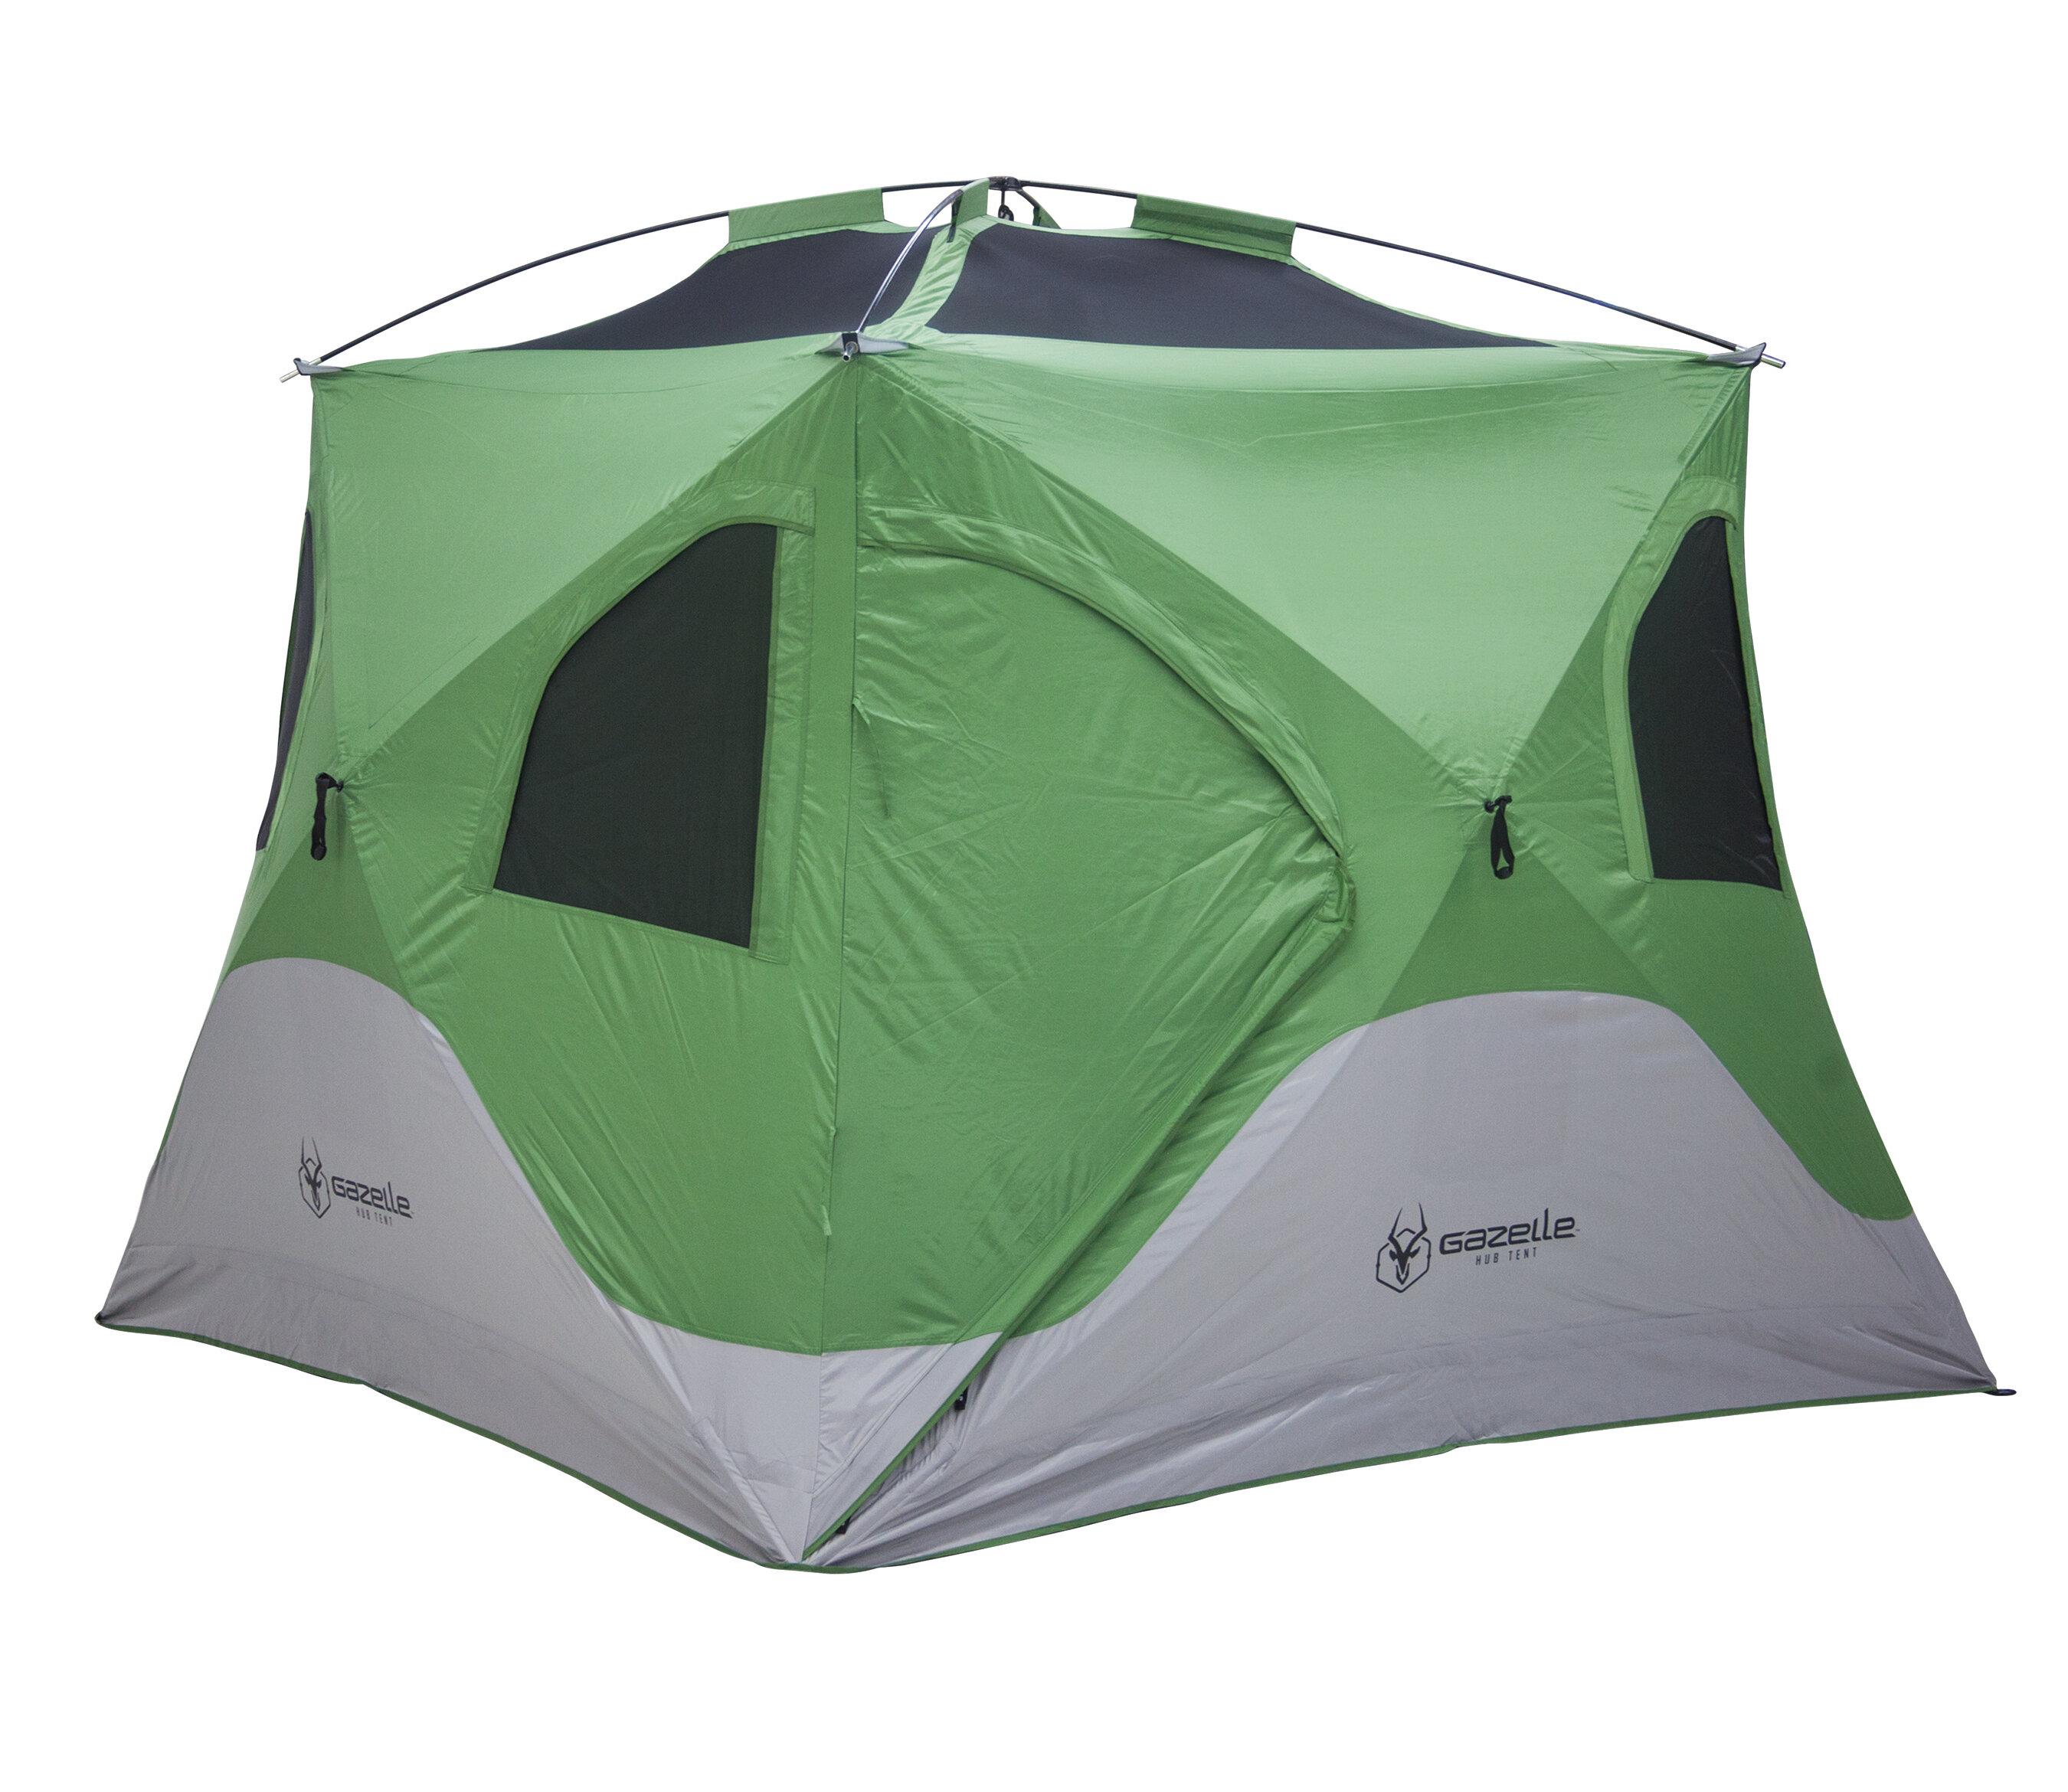 sc 1 st  Wayfair & Gazelle Pop Up Portable Camping Hub 3 Person Tent u0026 Reviews | Wayfair